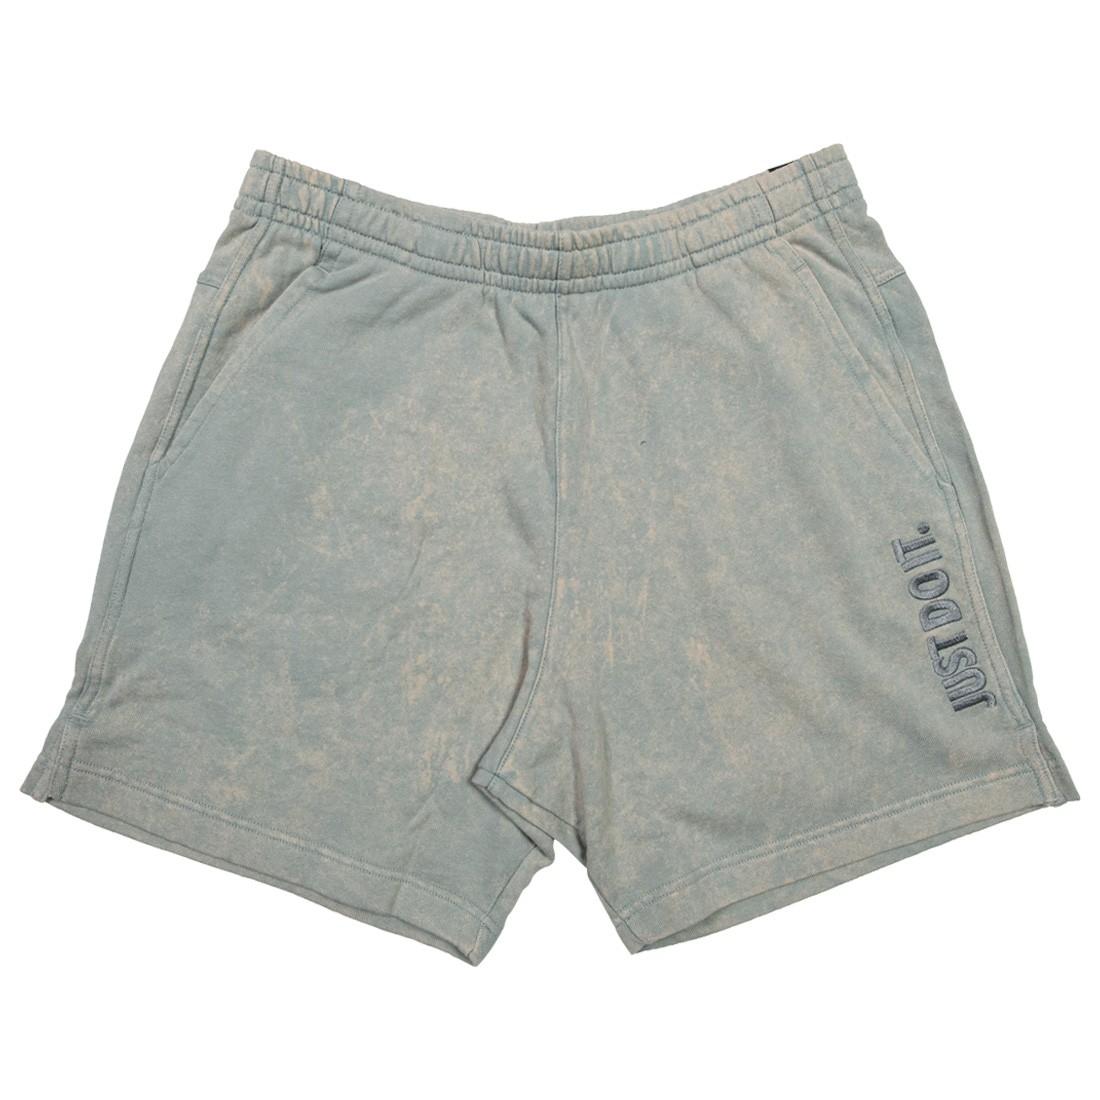 Nike Men Sportswear Jdi Shorts (lt smoke grey / lt smoke grey)